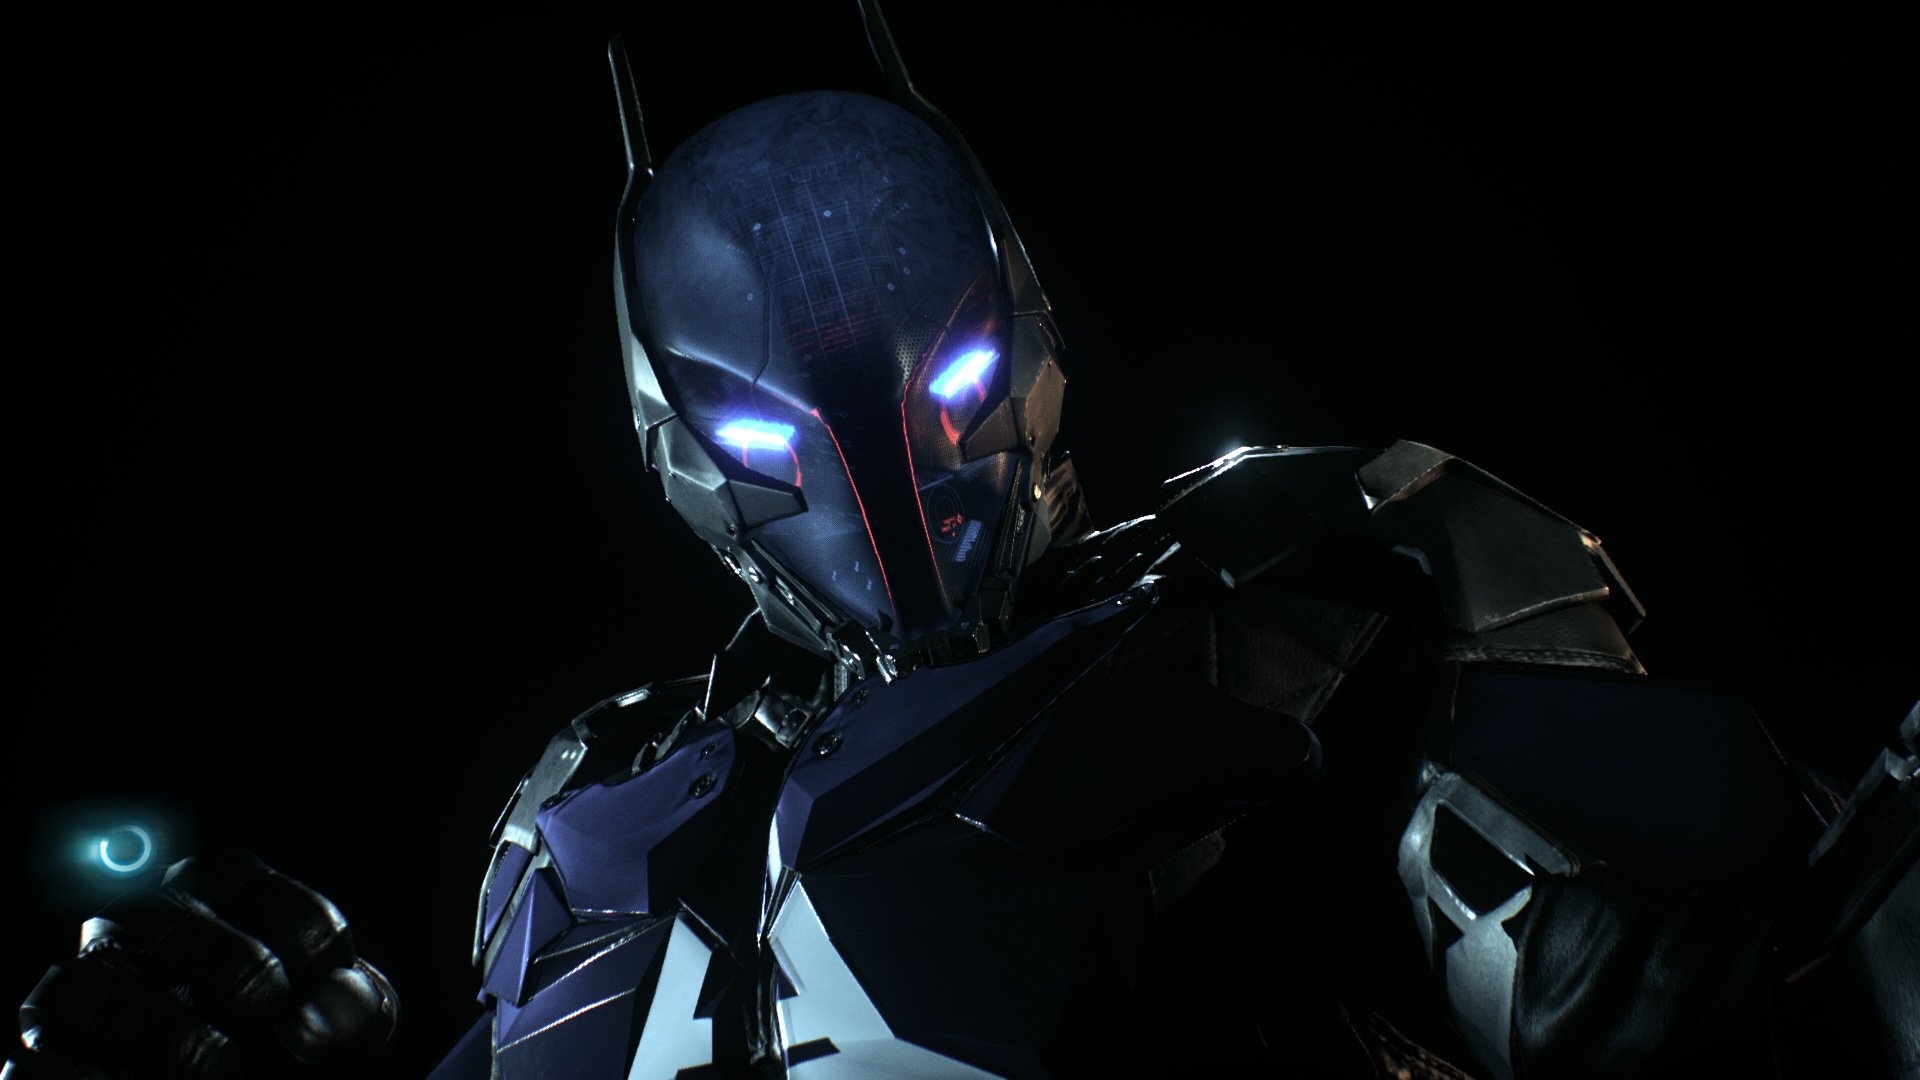 batman_arkham_knight-3129229